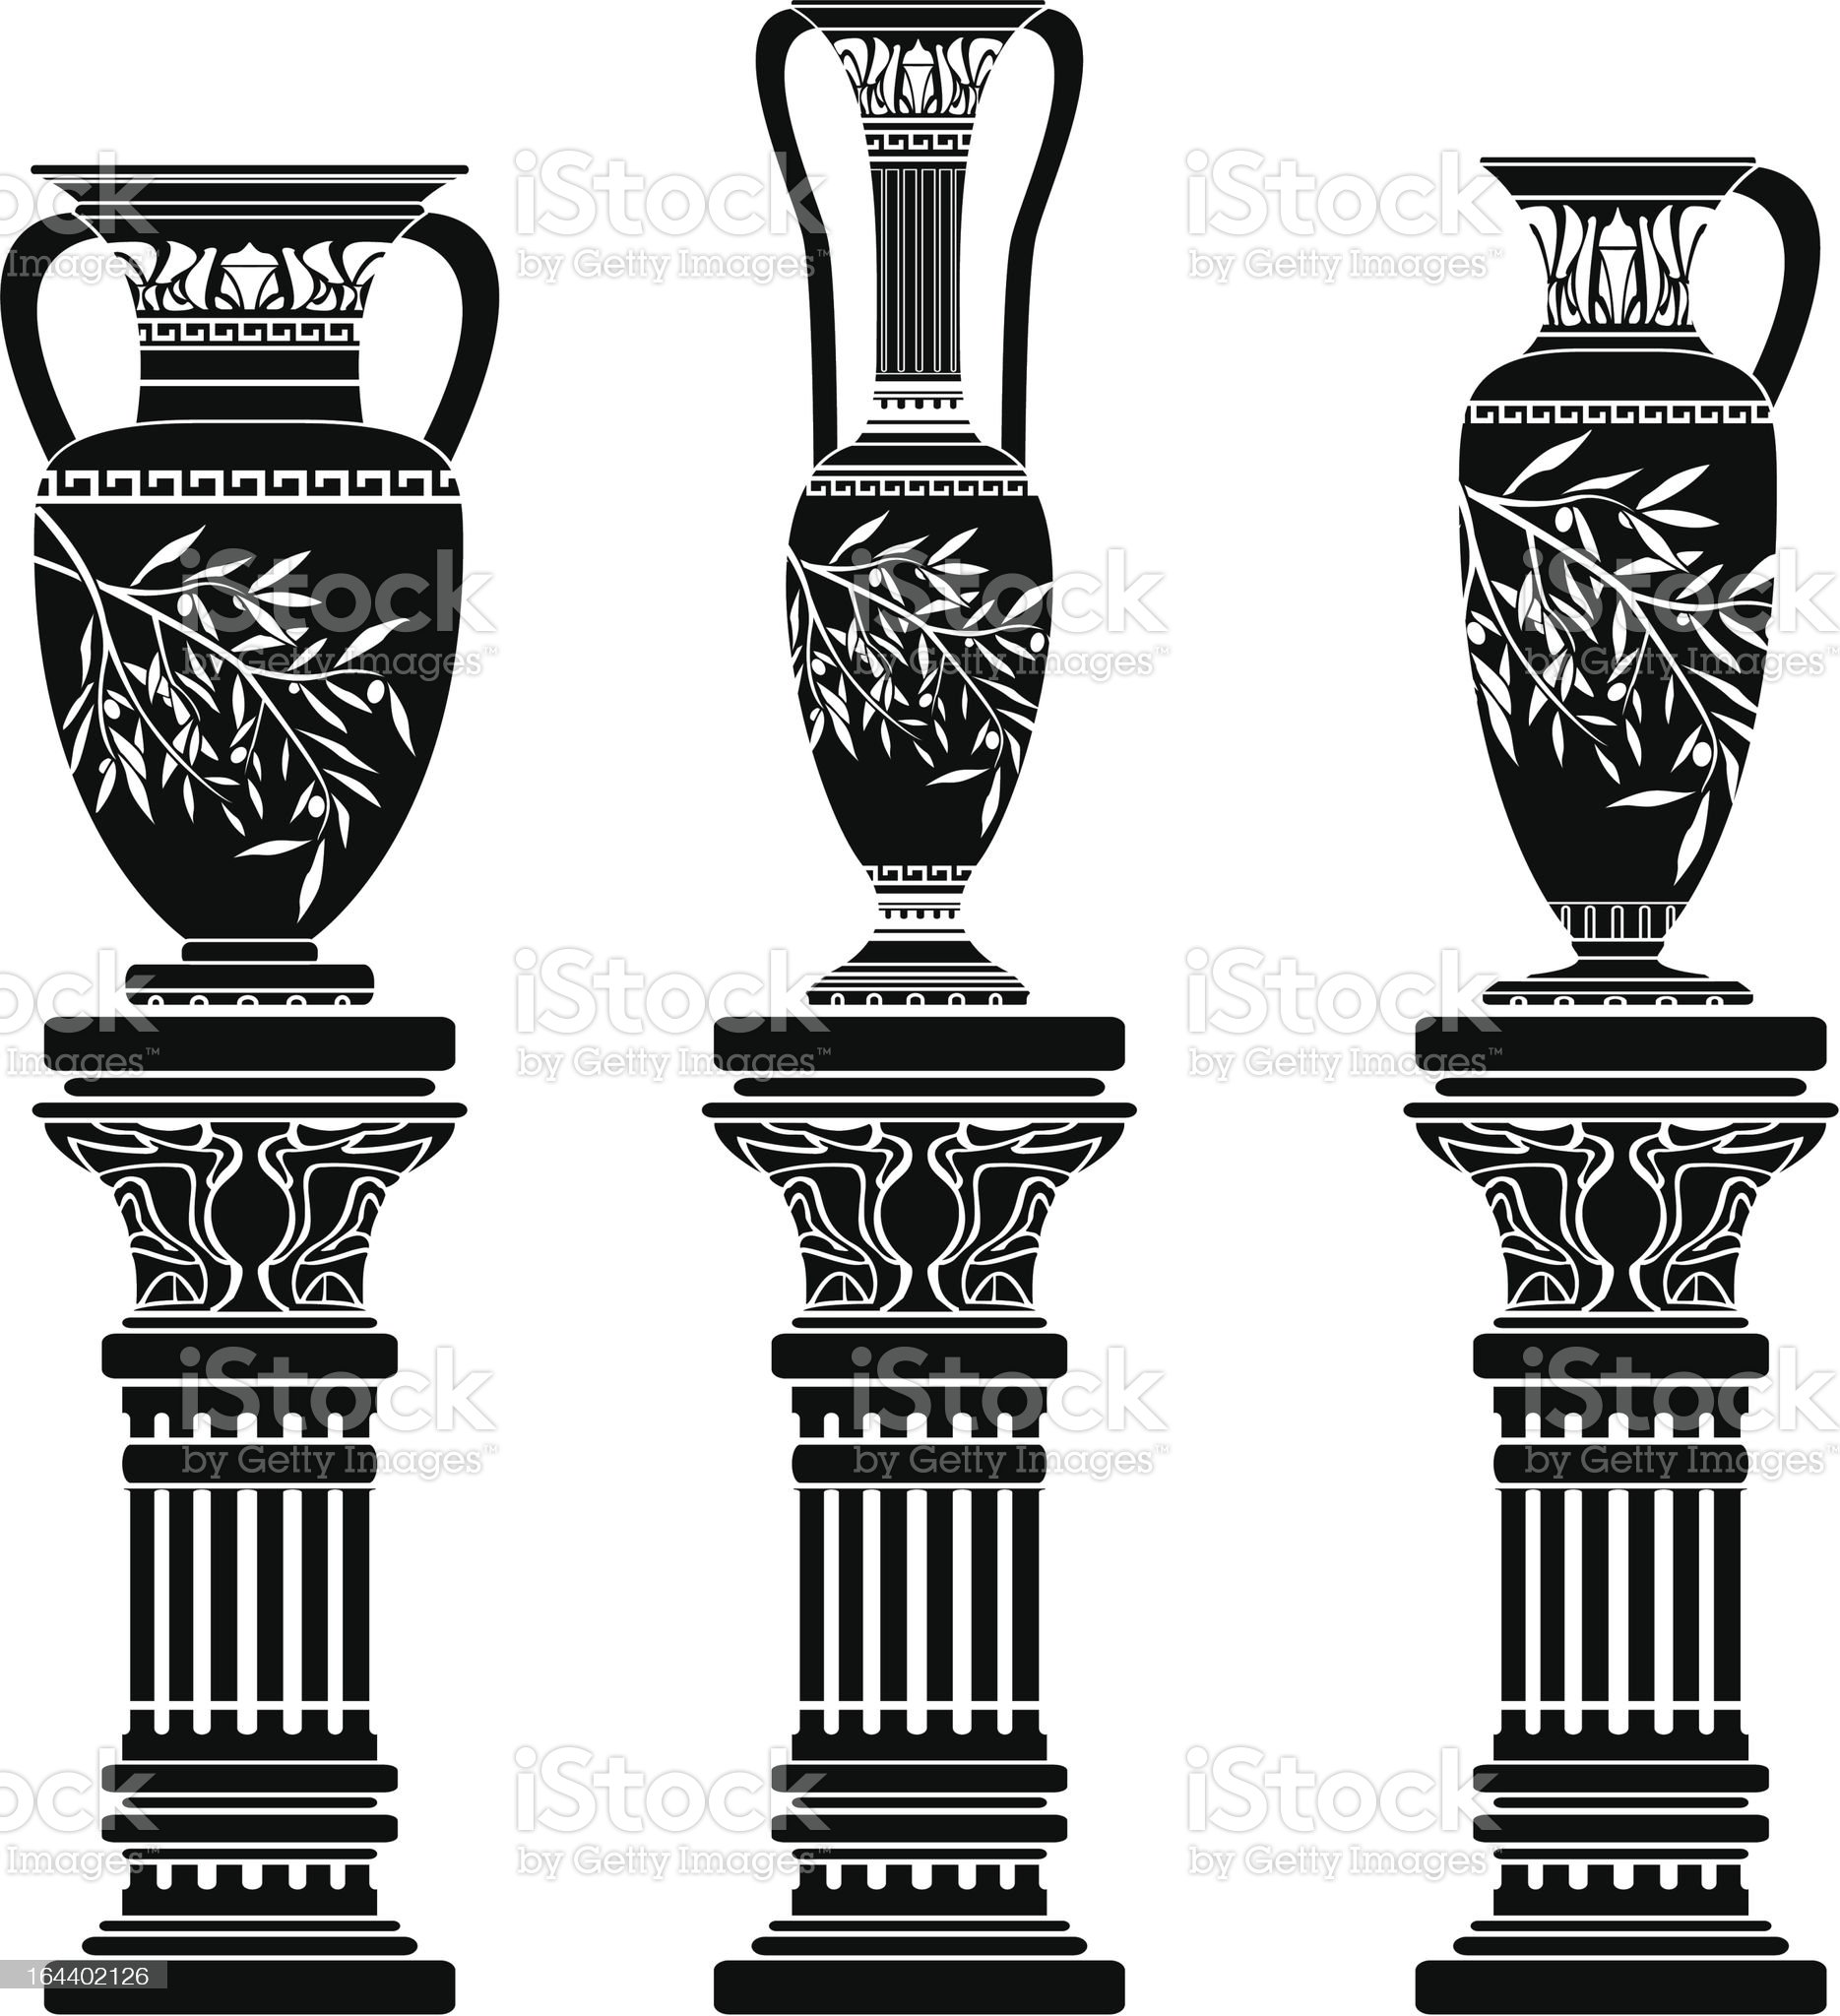 amphoras and jug royalty-free stock vector art